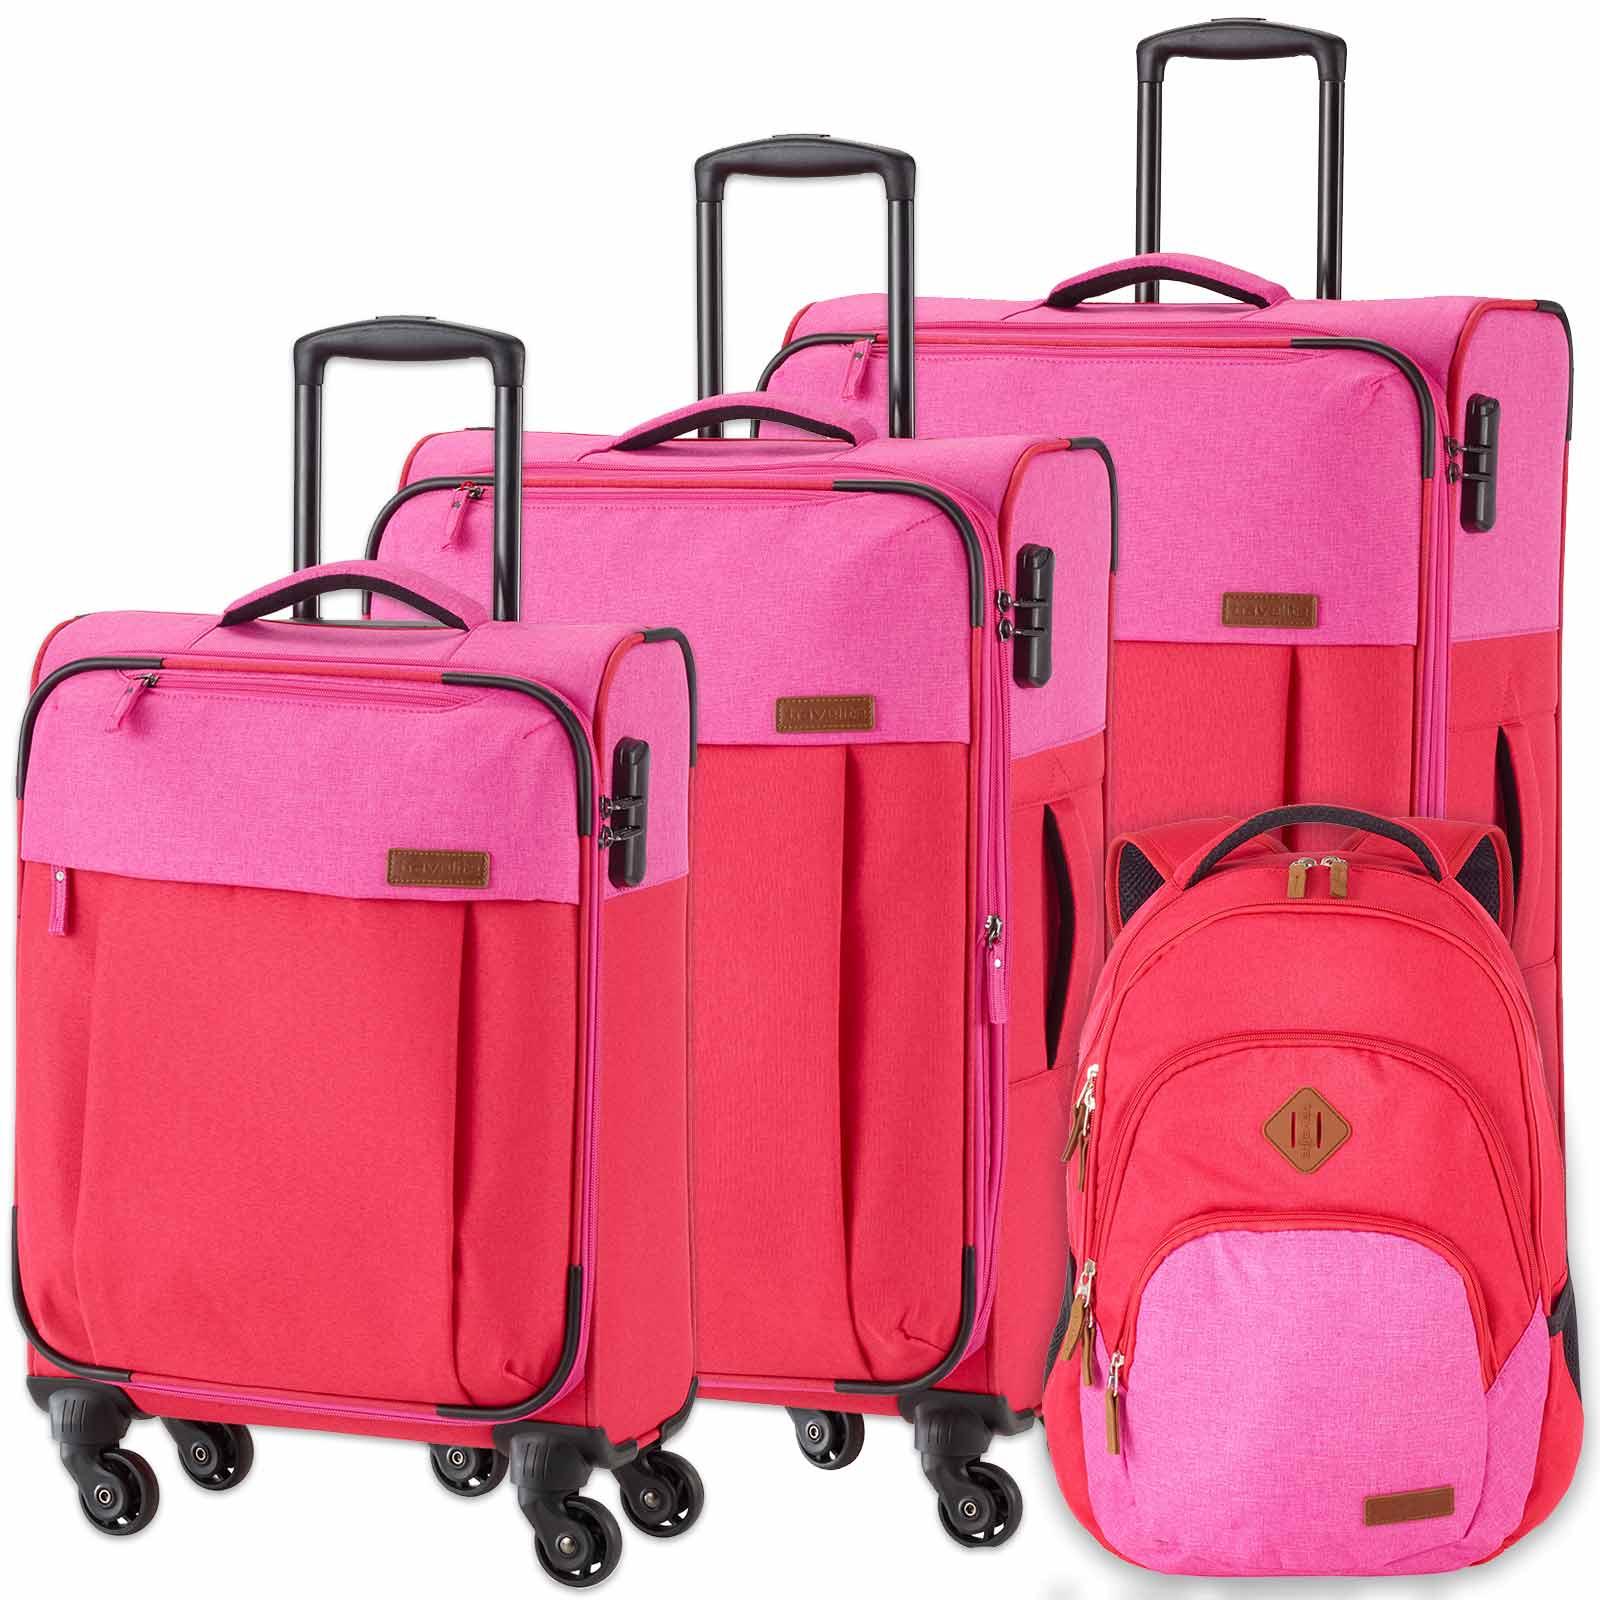 travelite-neopak-4-tlg-trolley-set-mit-rucksack-rot-pink